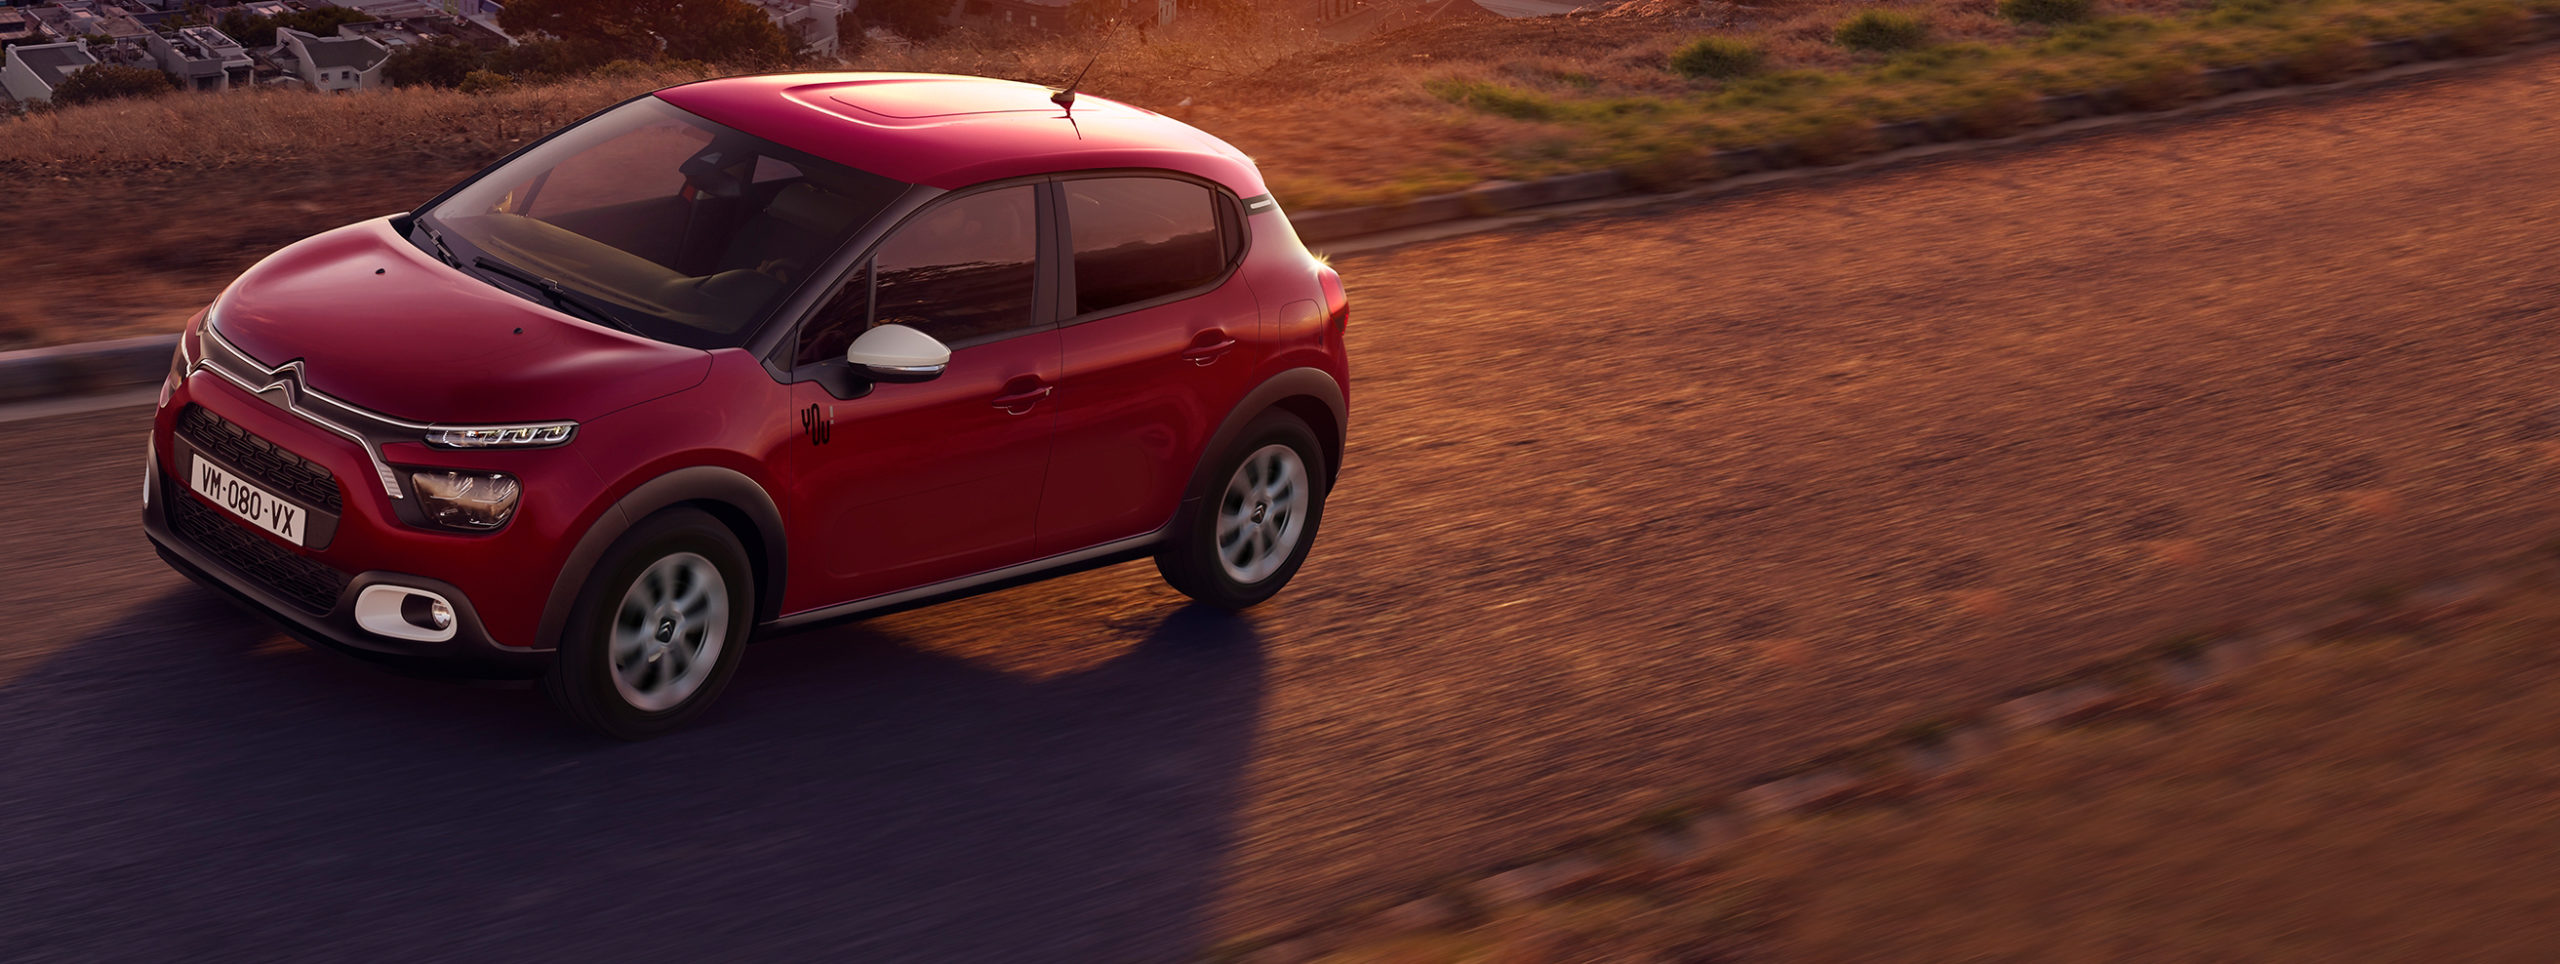 Serie especial Citroën C3 YOU!